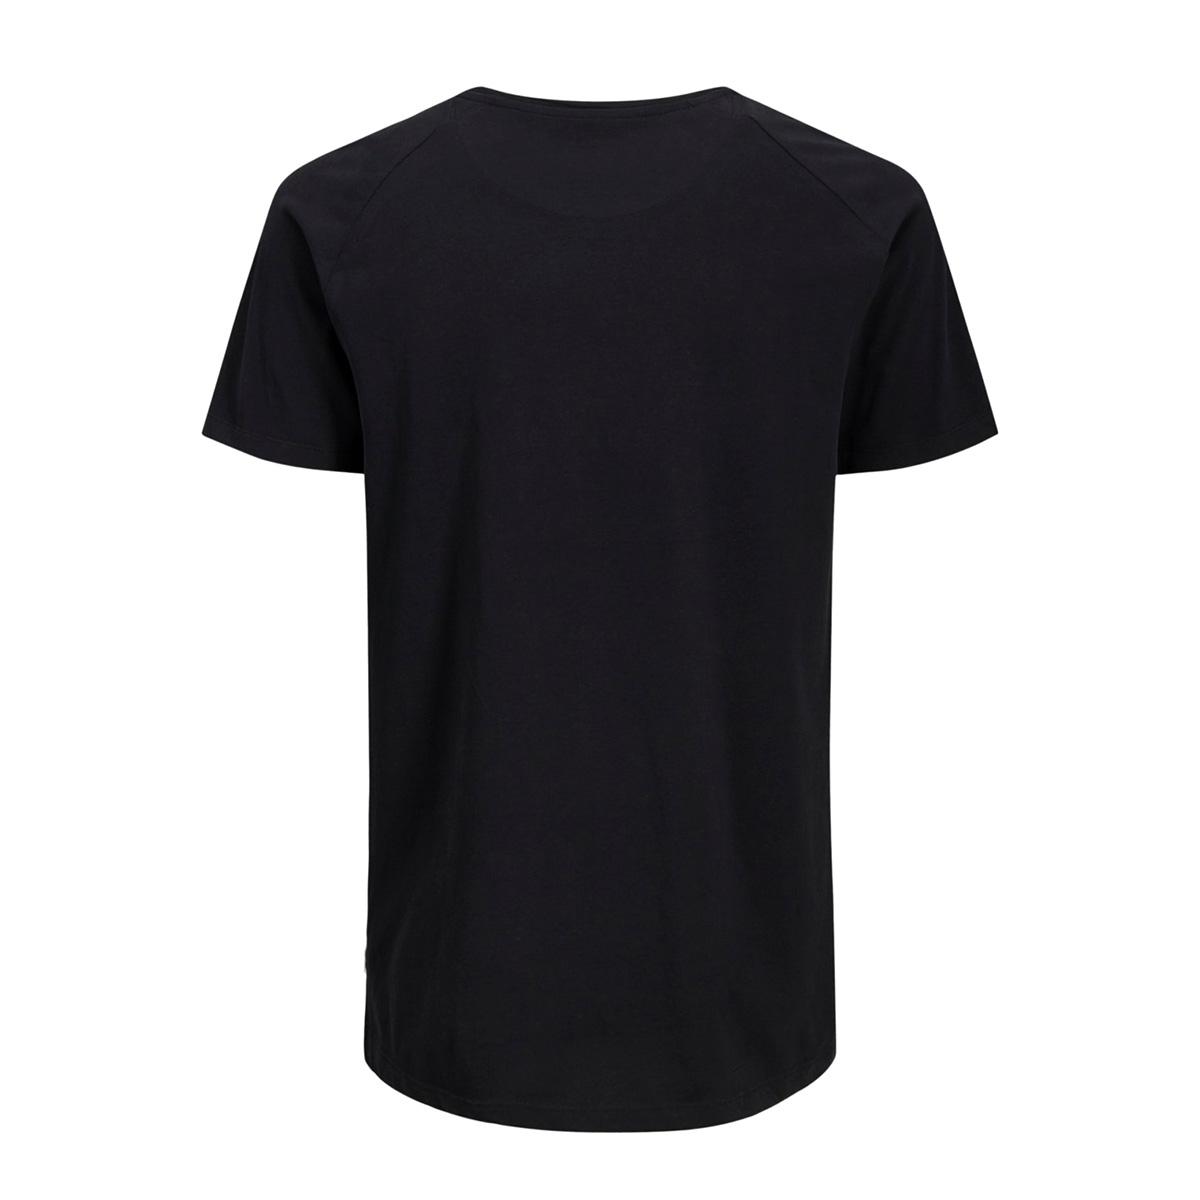 jjecurved tee ss o-neck noos 12164936 jack & jones t-shirt black/reg